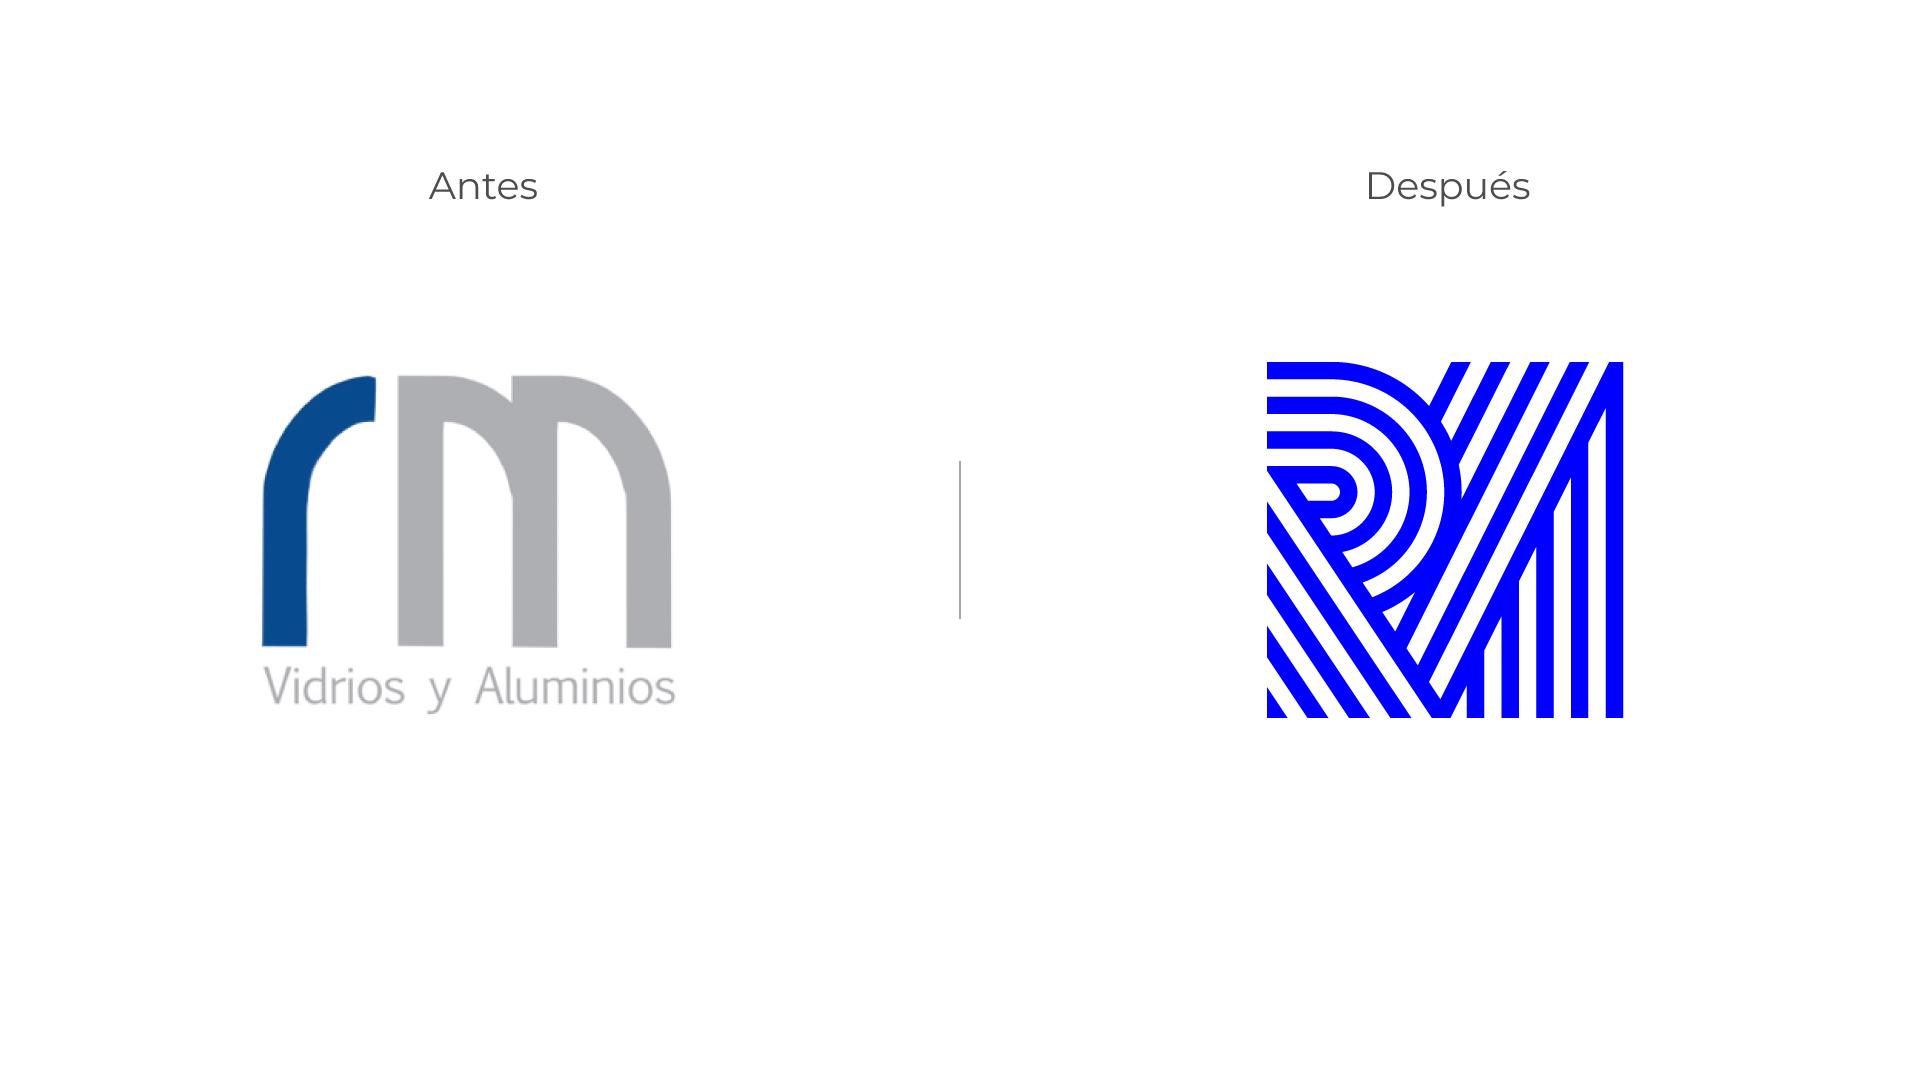 RM Vidrios Aluminios Branding 1.png